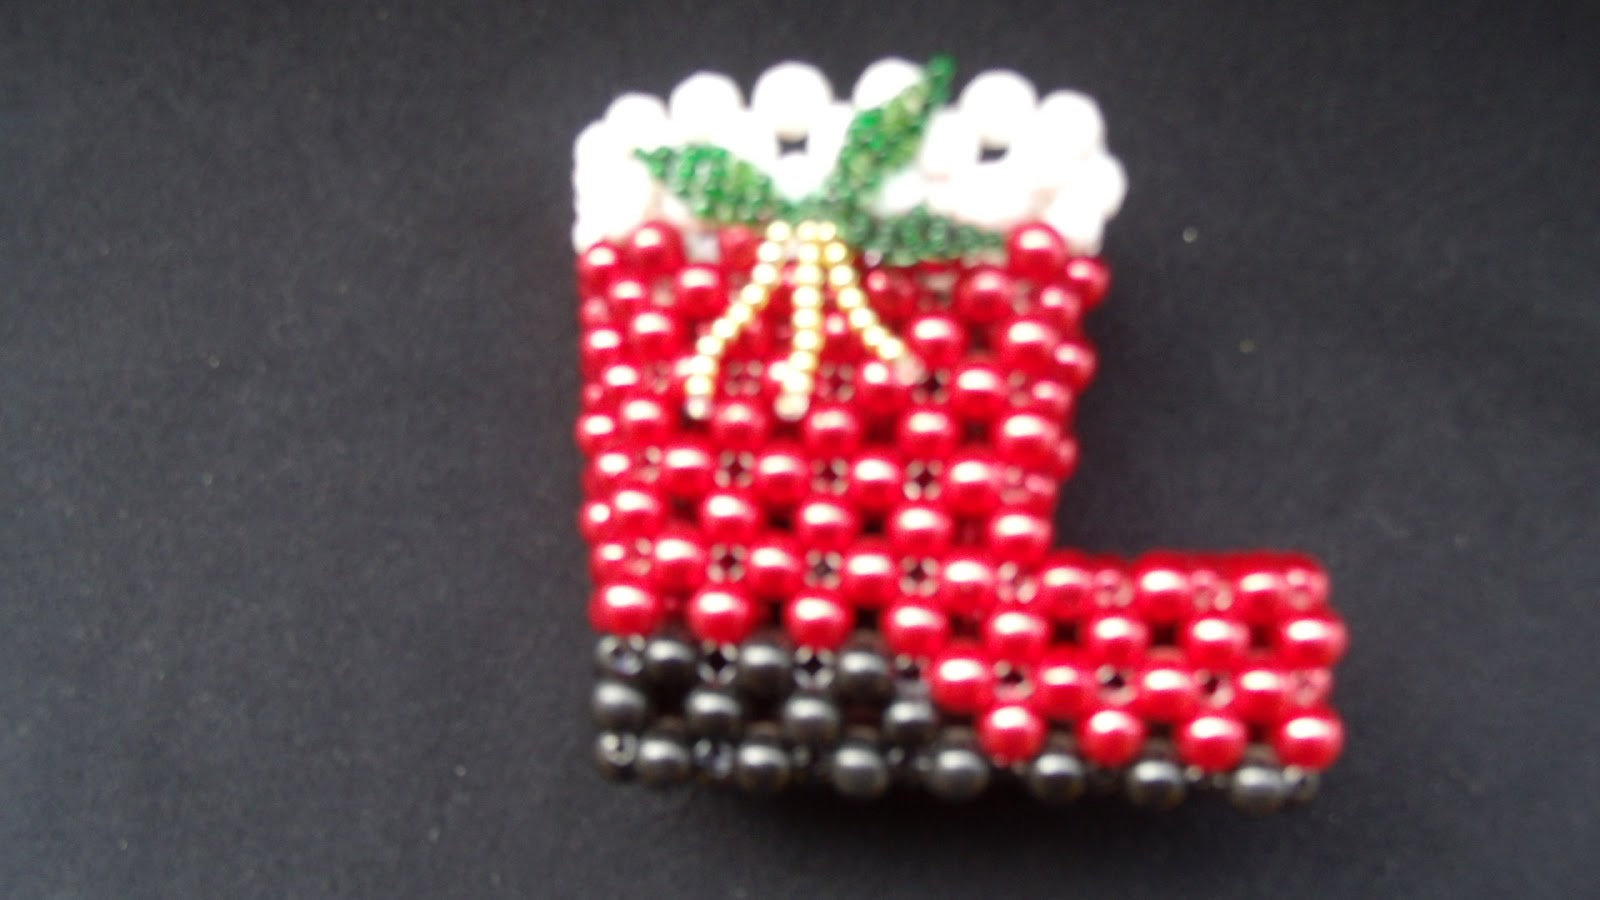 Manualidades en perlas adornos navide os - Trabajos manuales navidenos ...